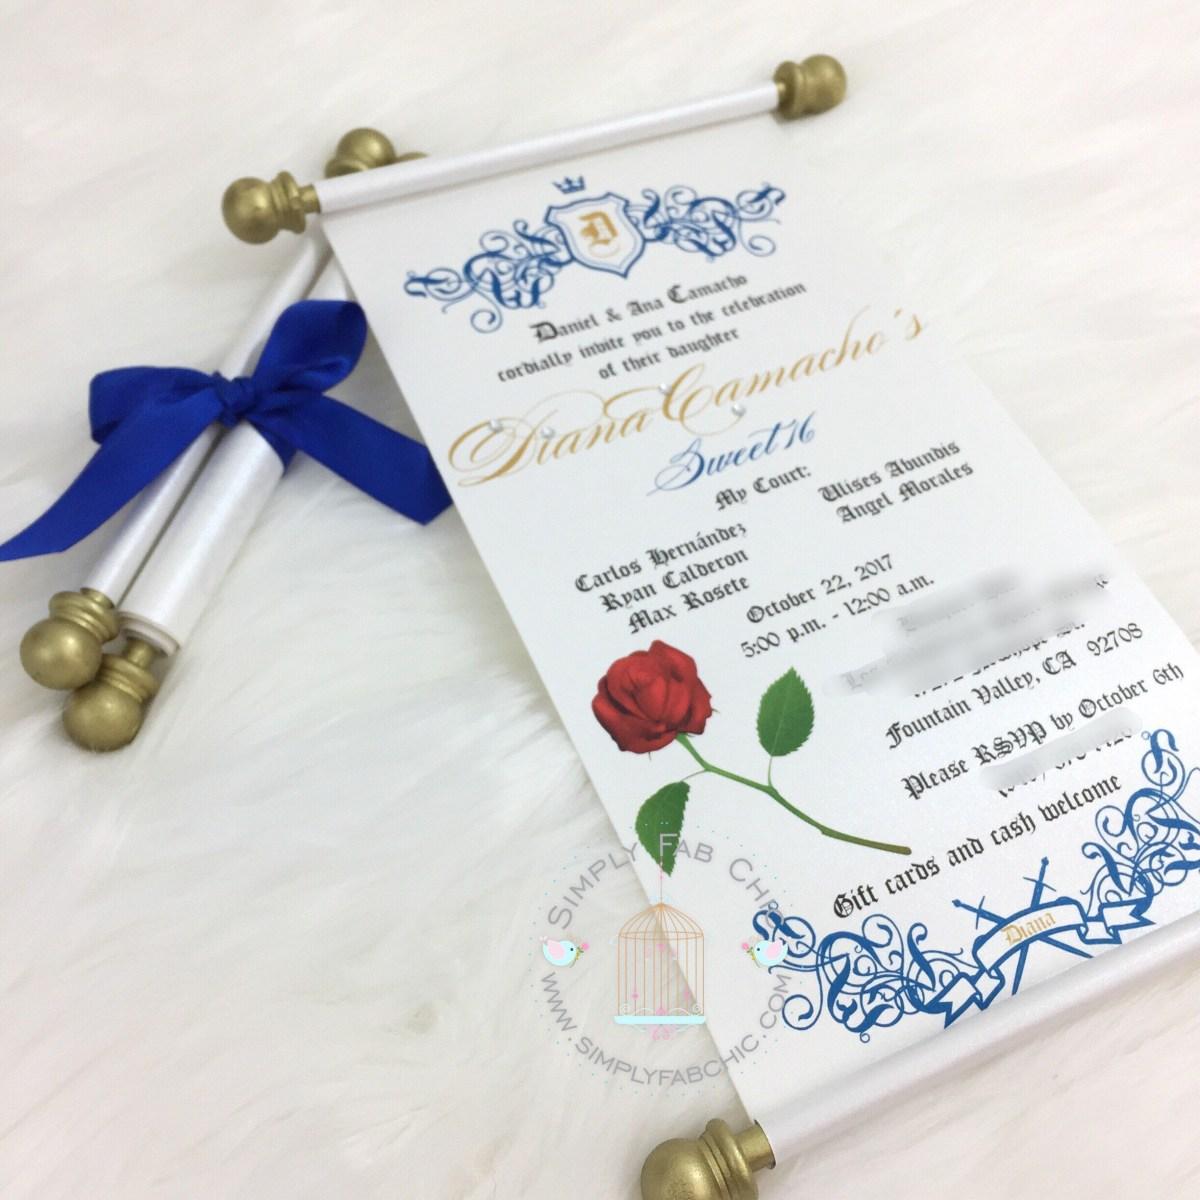 Beauty And The Beast Wedding Invitations Beauty And The Beast Scroll Invitation Birthday Wedding Etsy